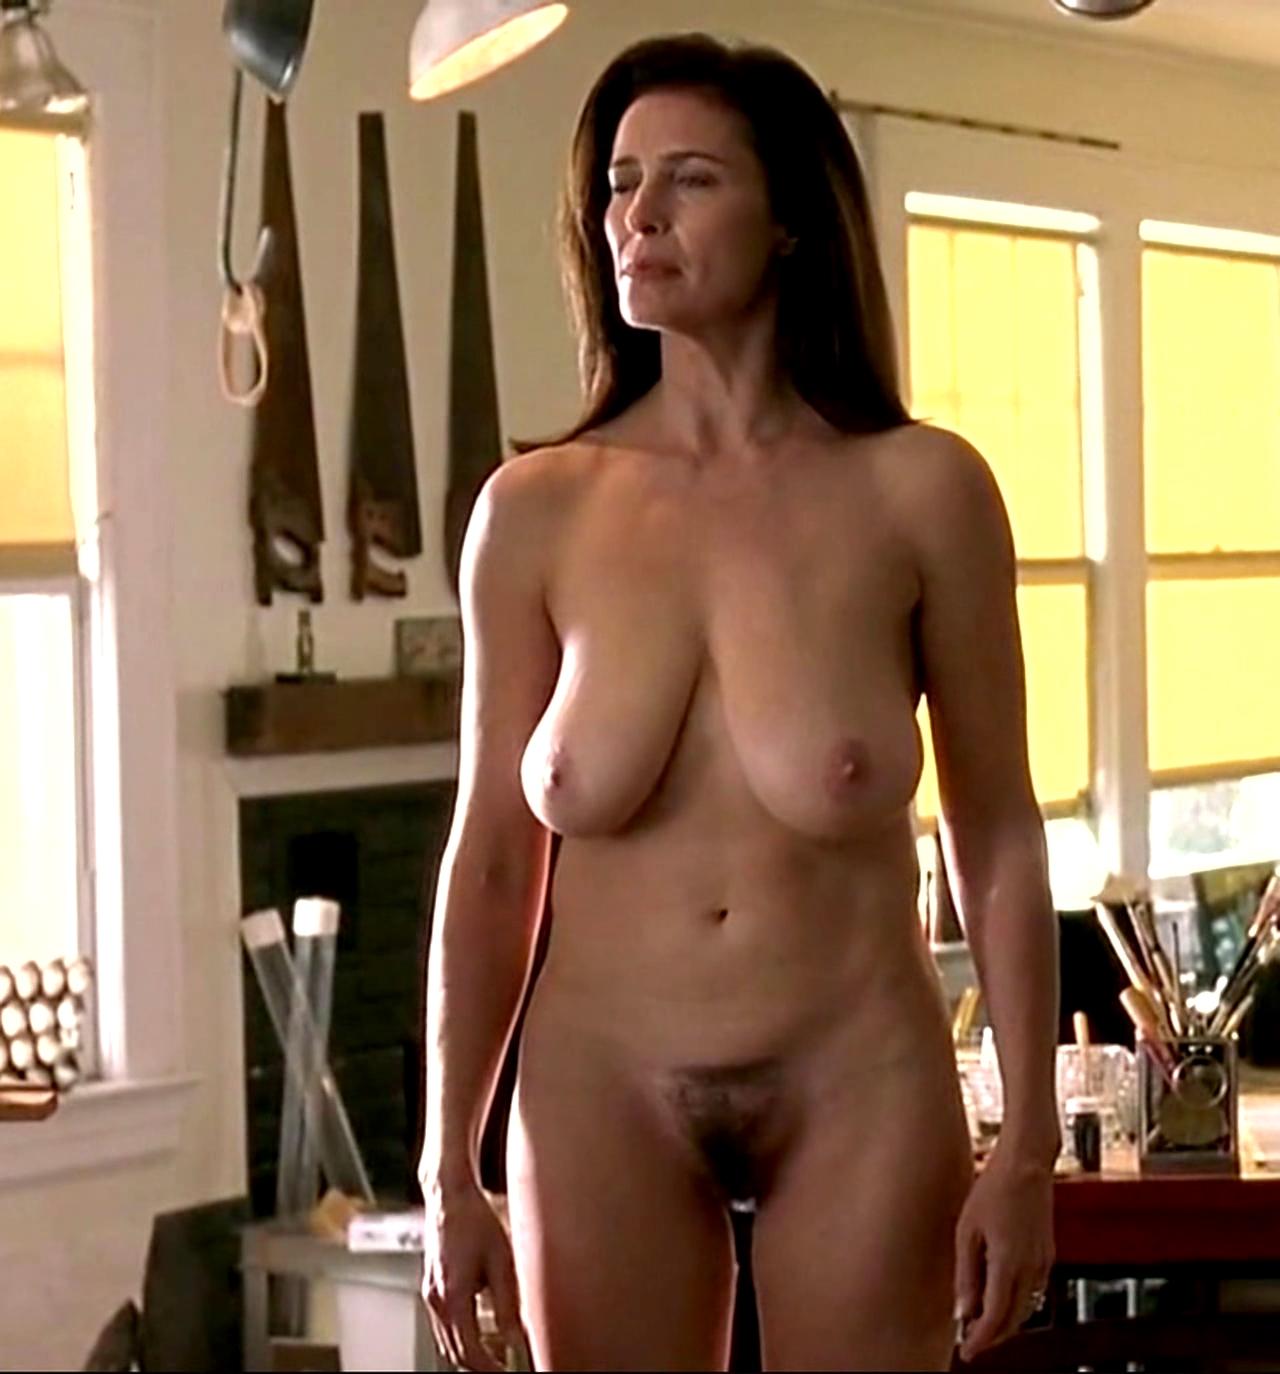 tumblr celebrities nude